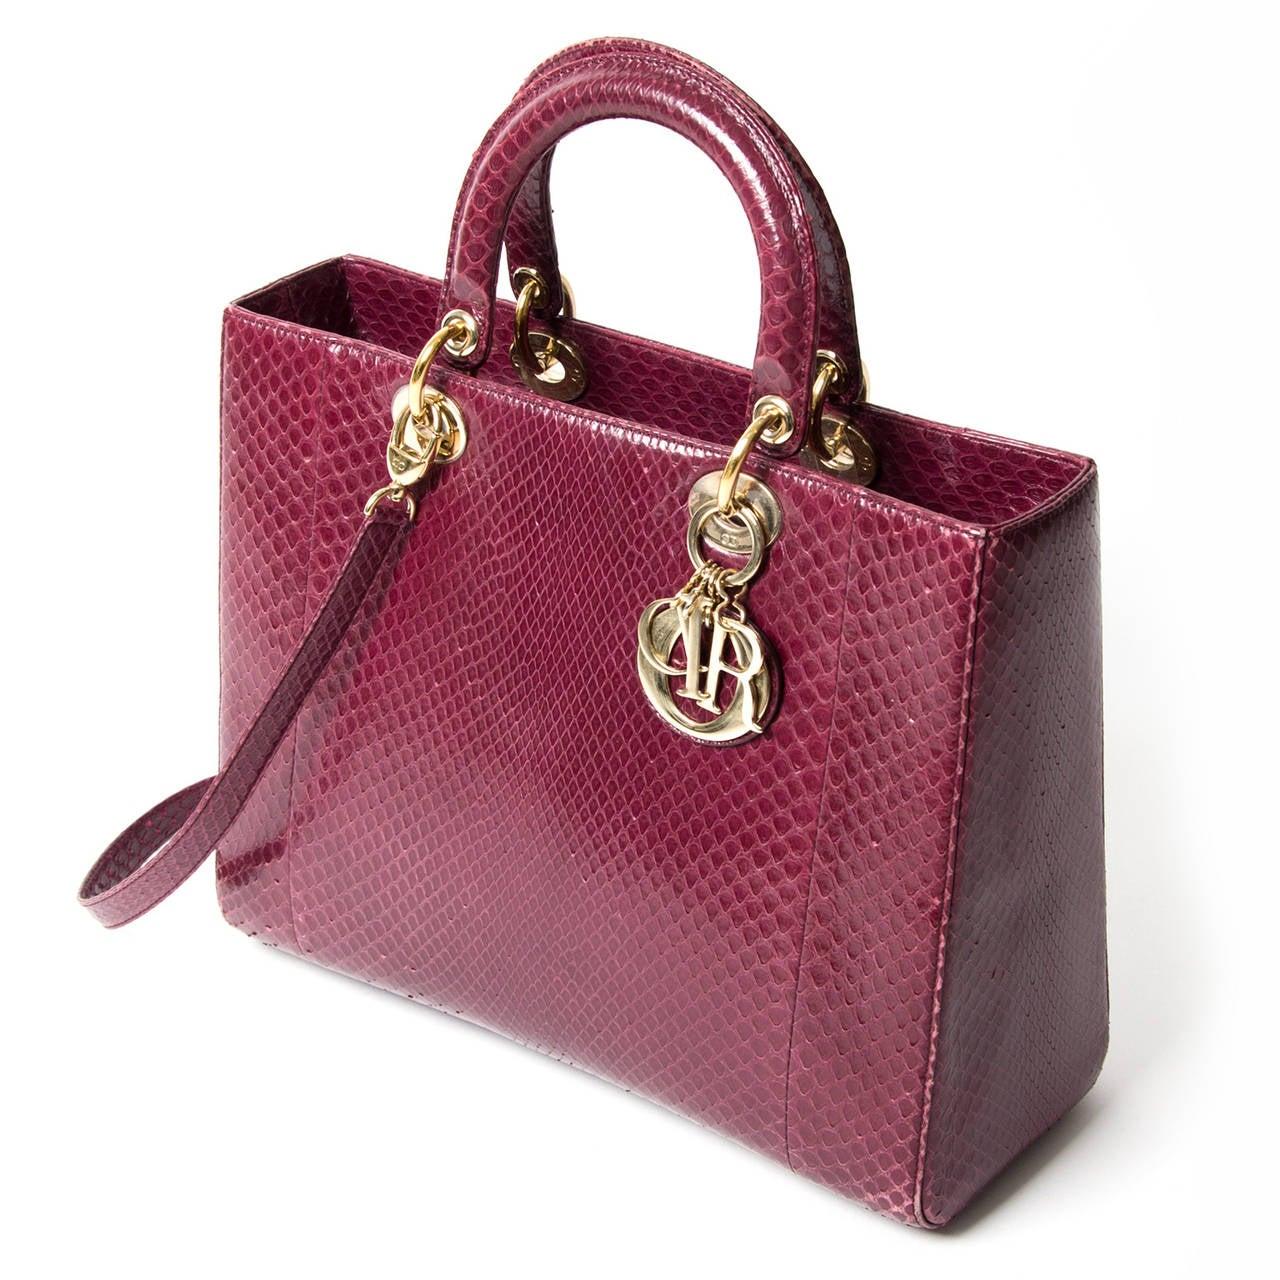 lady dior bag price - photo #40